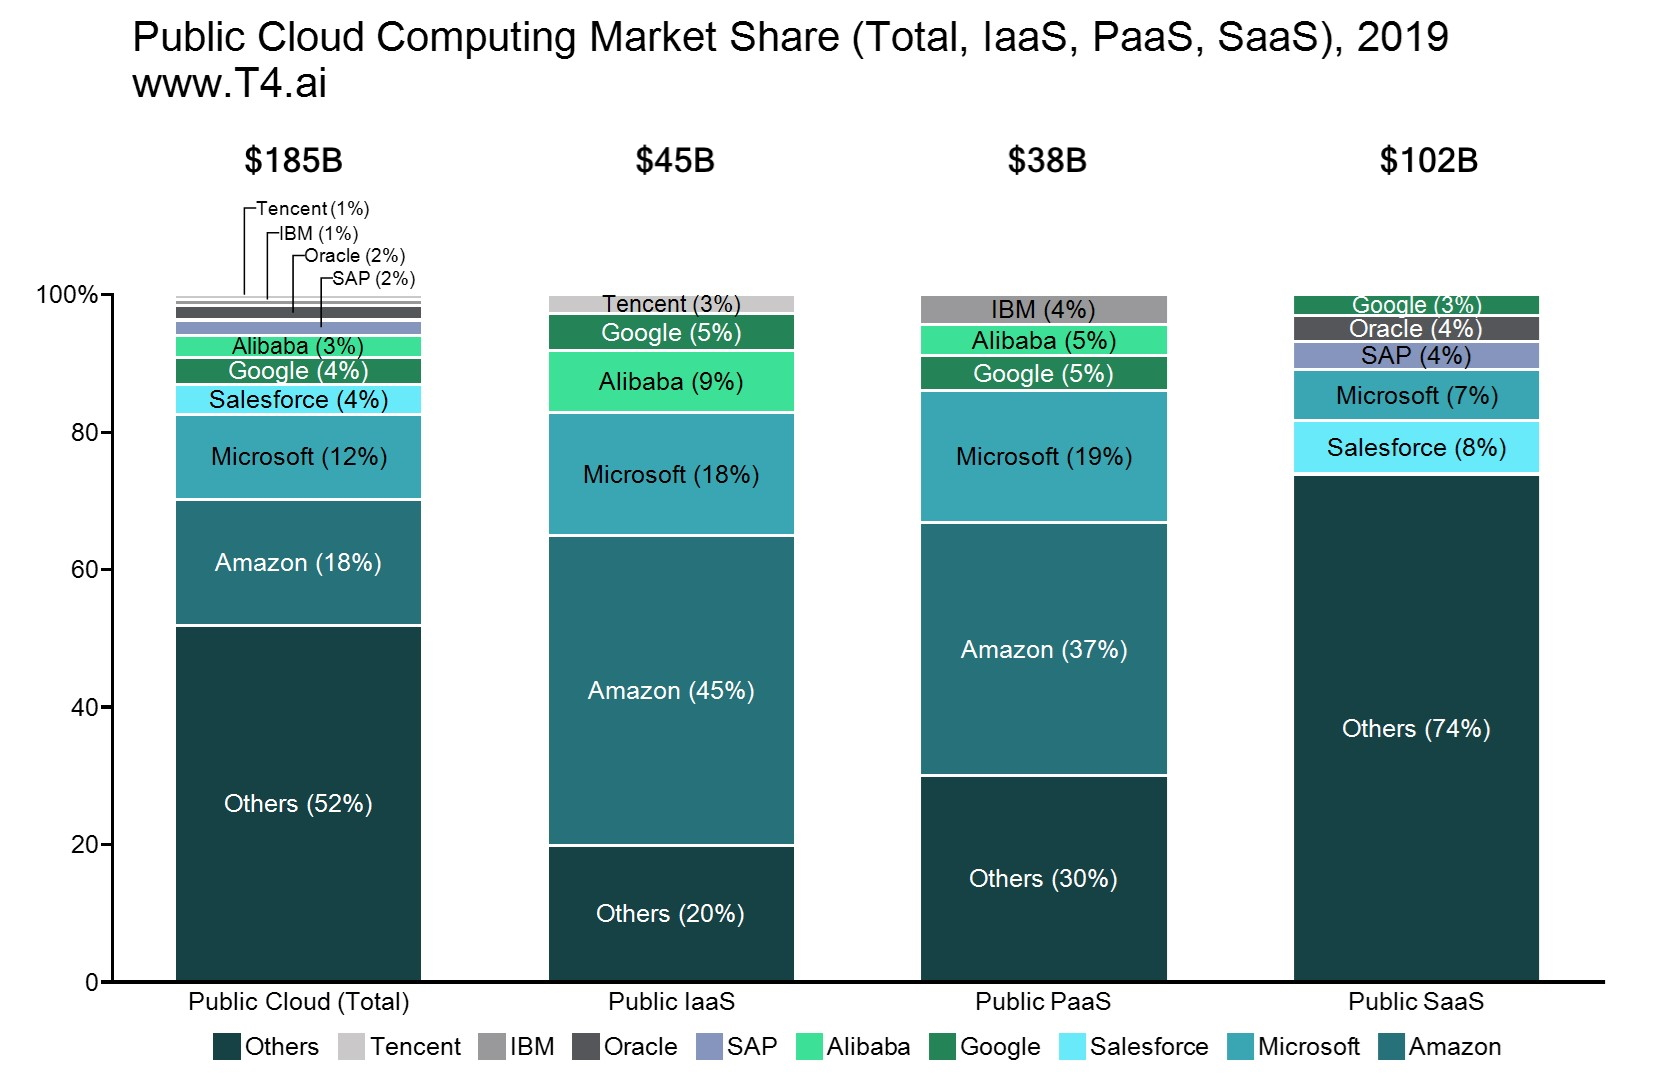 Amazon Cloud Computing Market Share